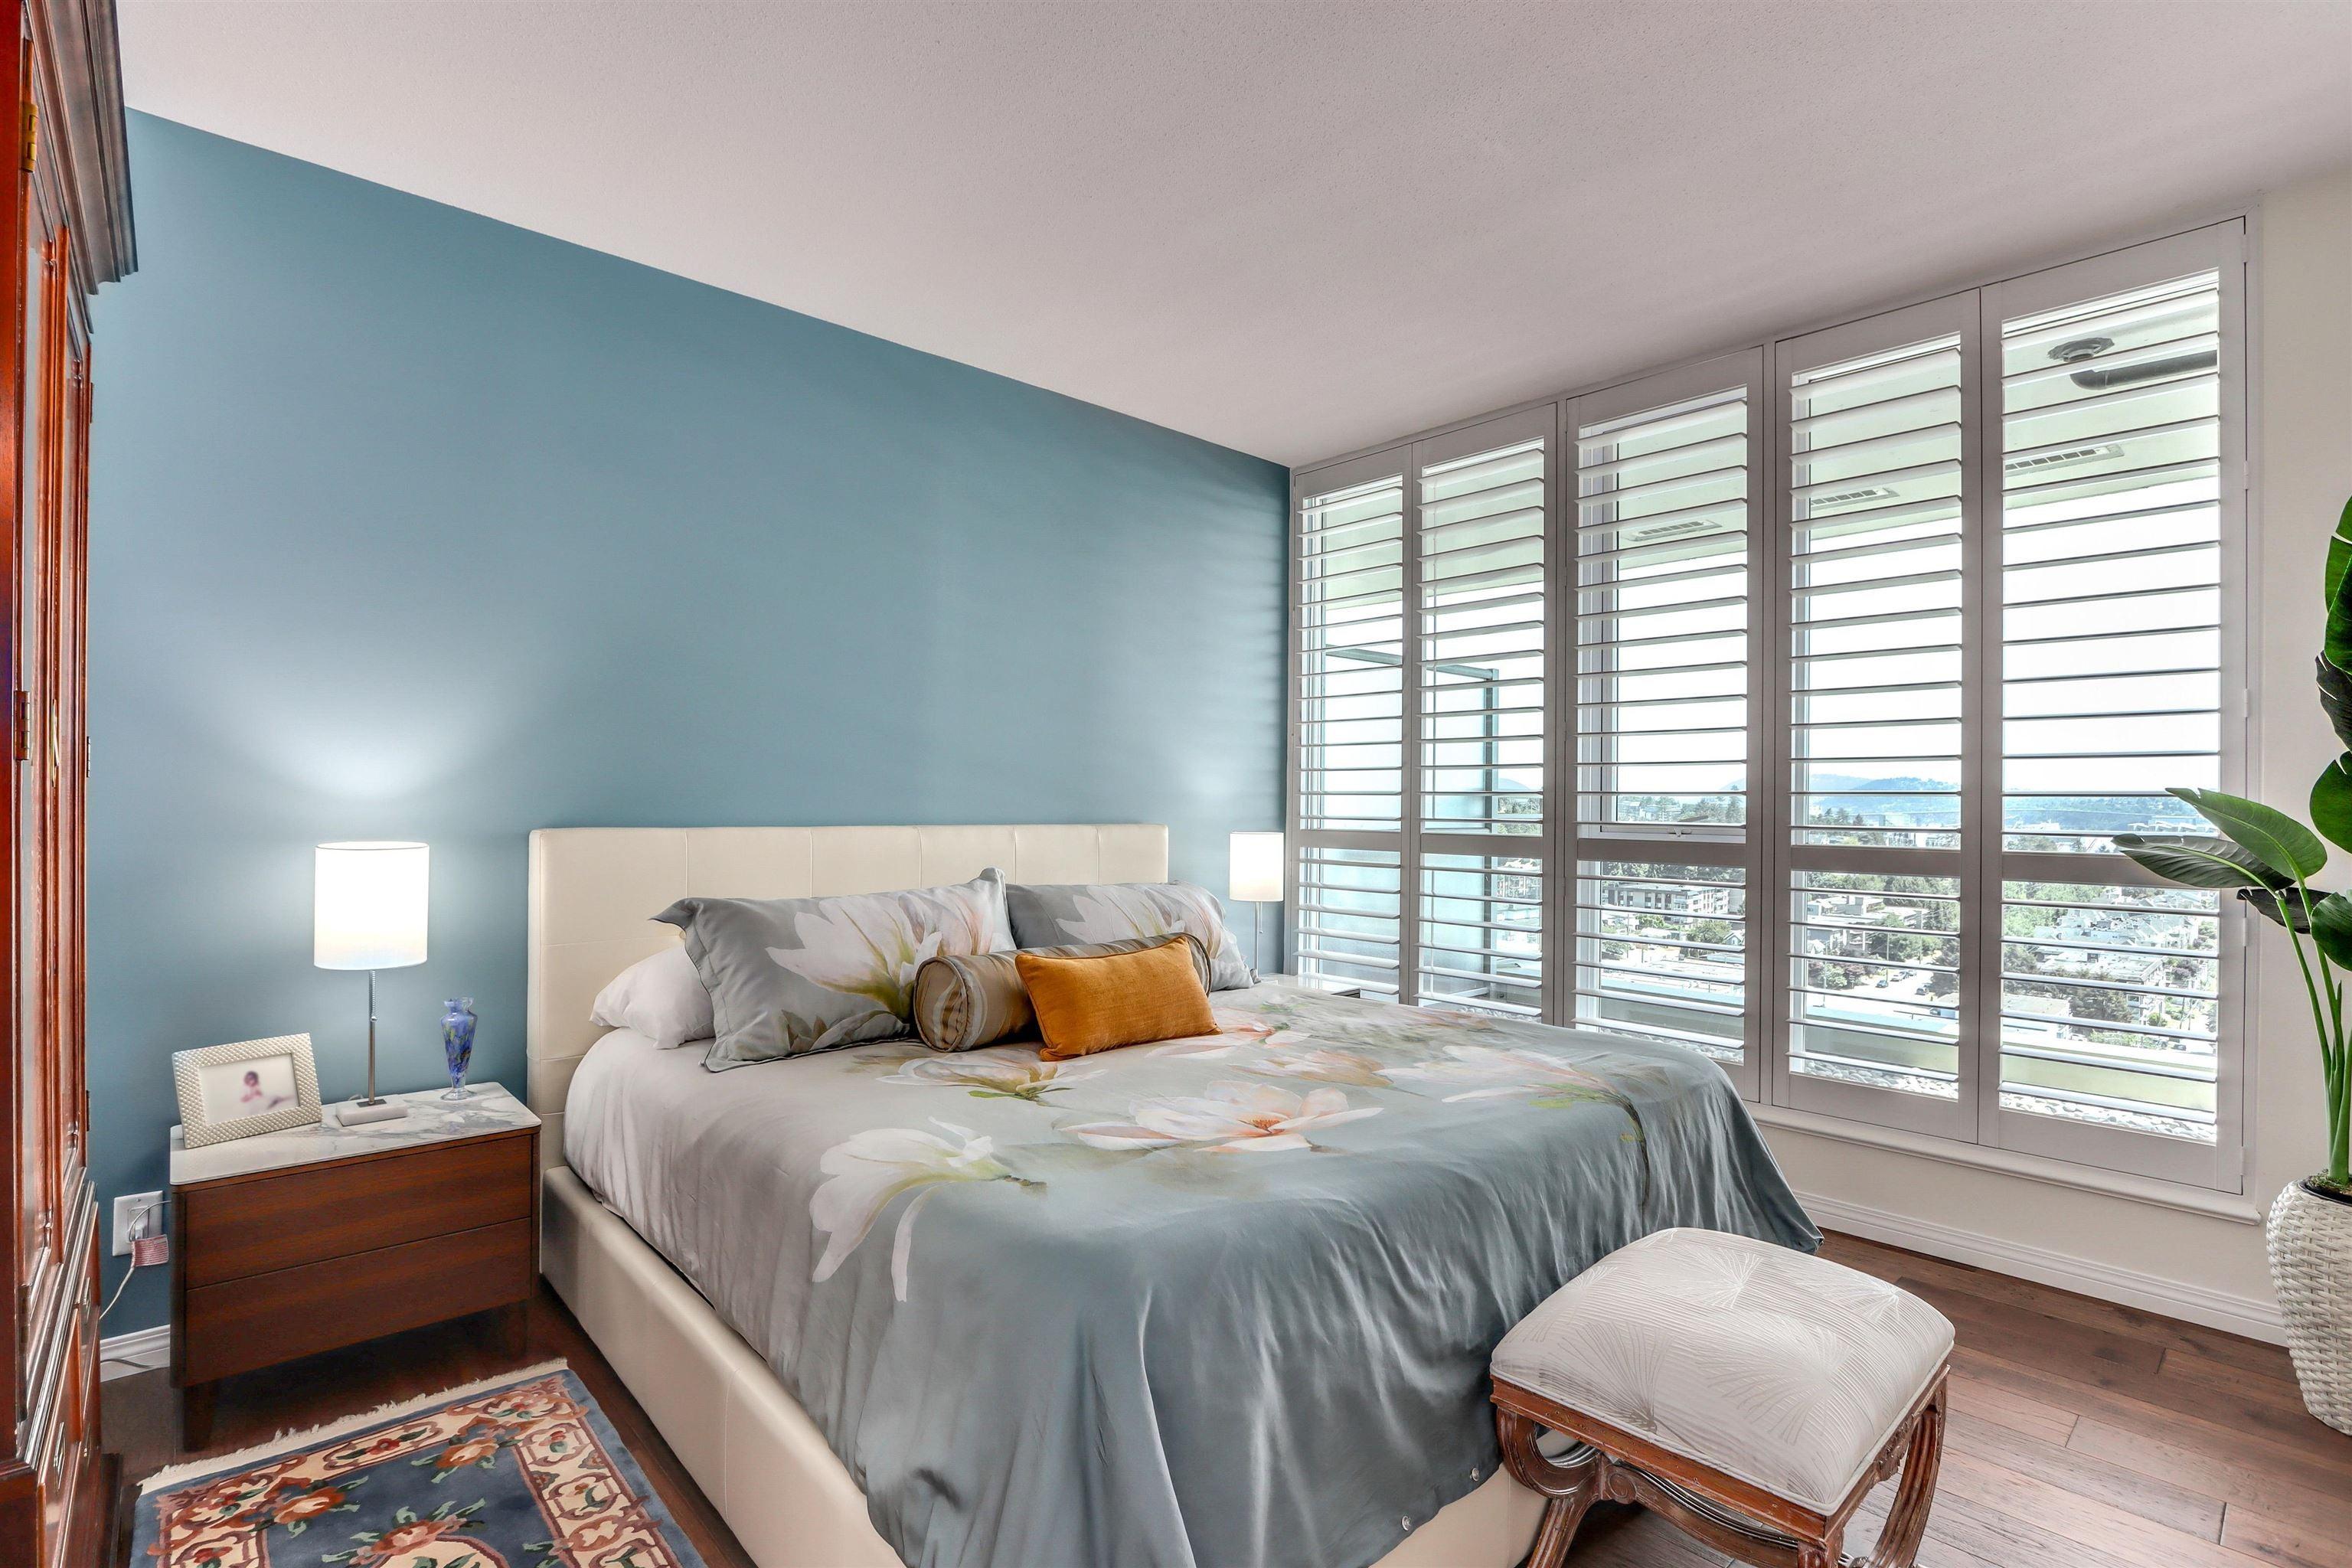 2202 188 E ESPLANADE - Lower Lonsdale Apartment/Condo for sale, 2 Bedrooms (R2618412) - #16